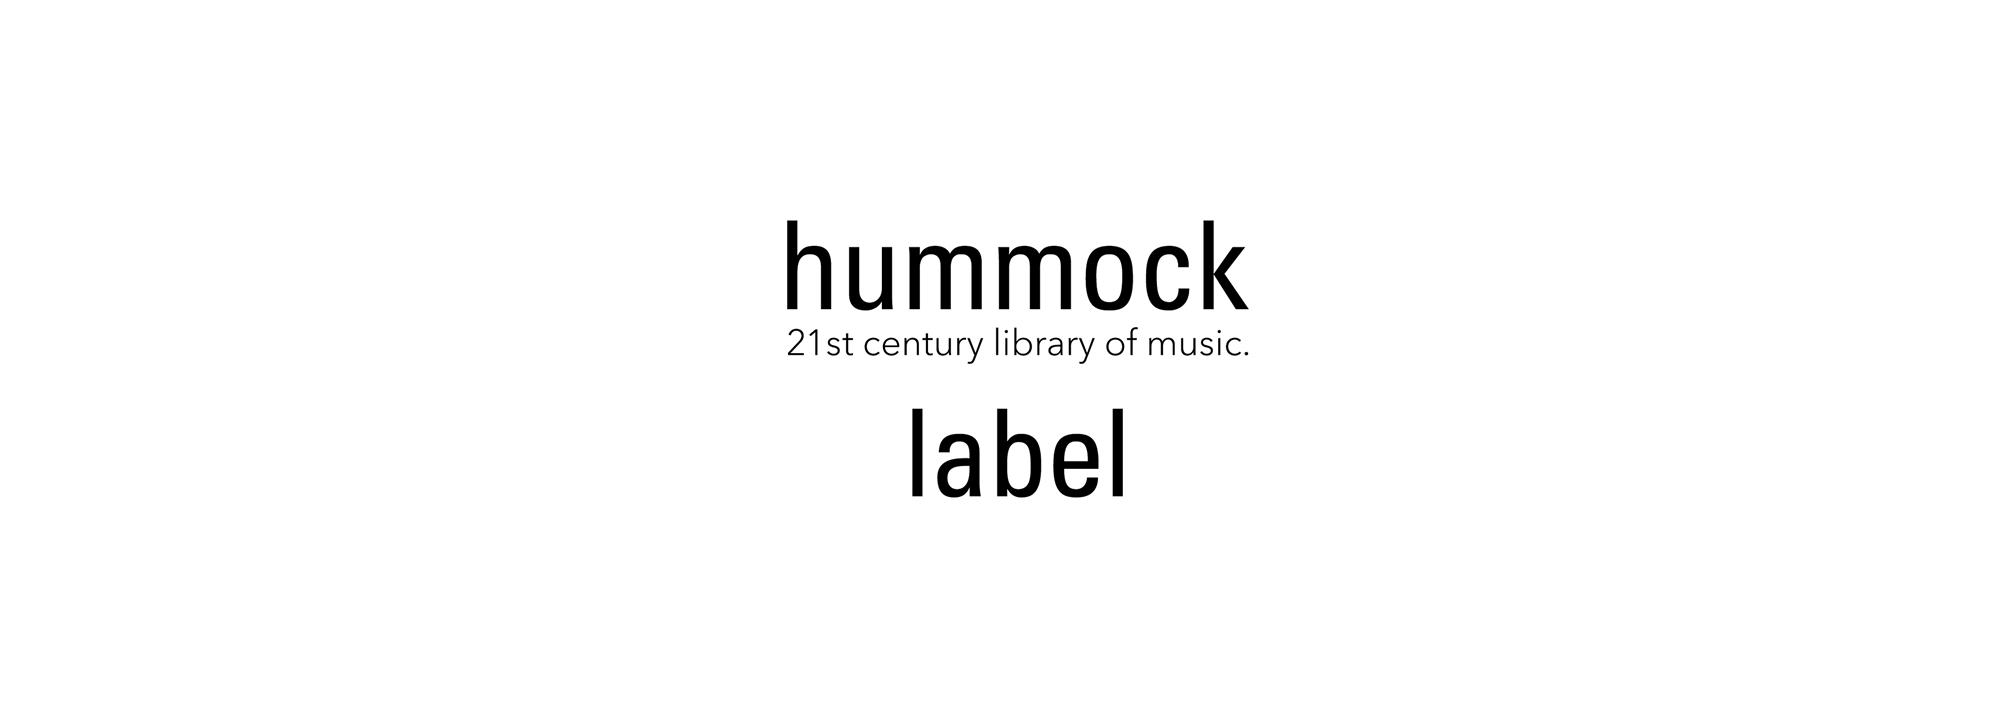 hummologo-1